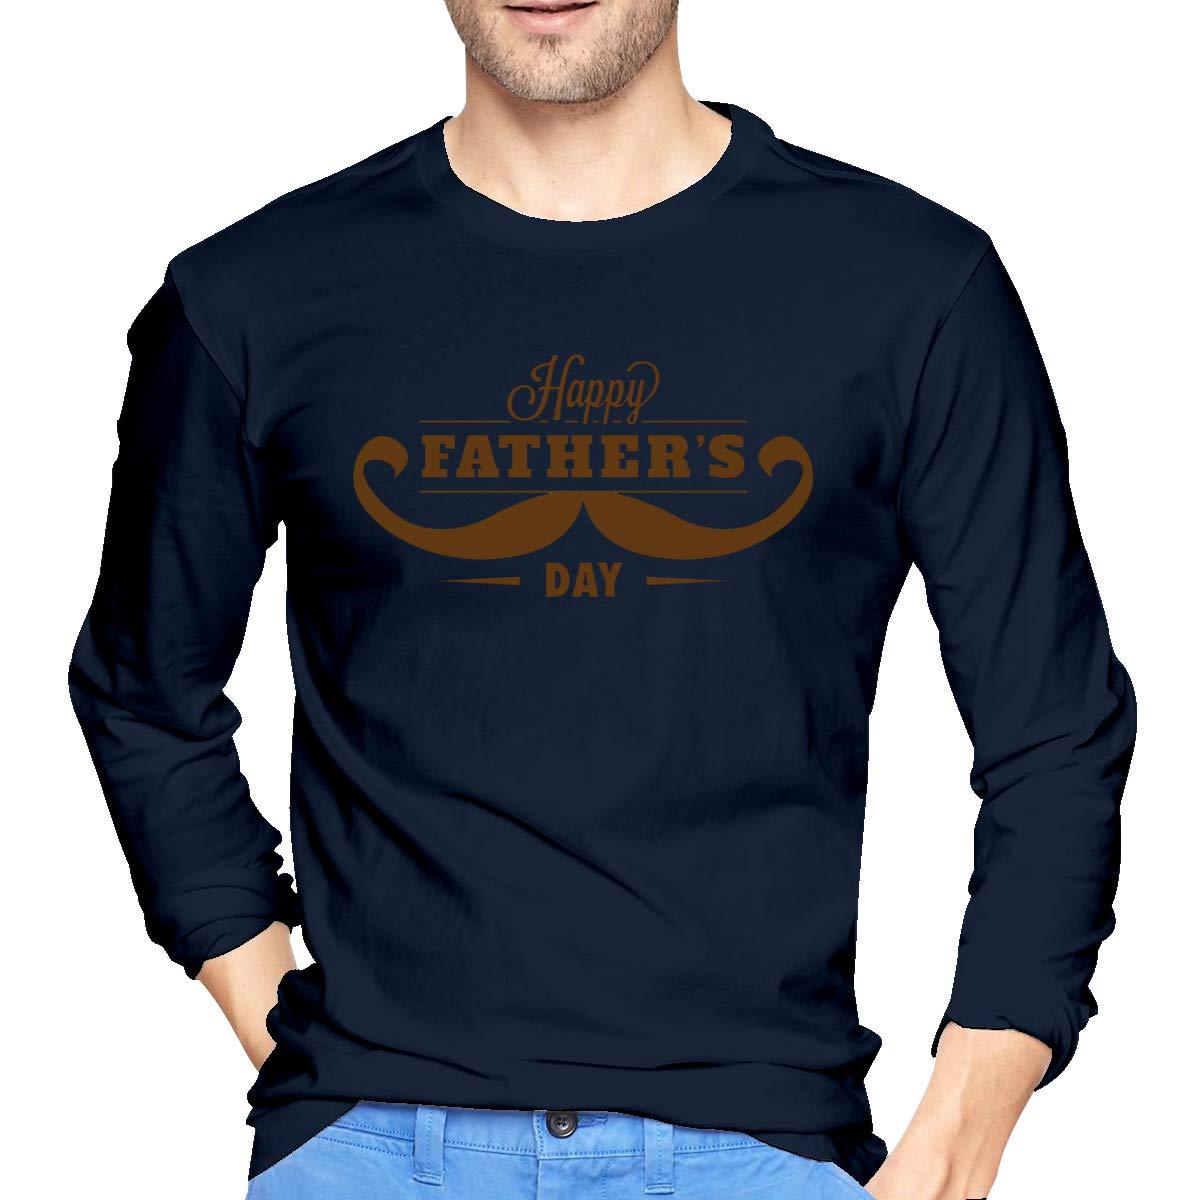 LONGTENG Design Happy Fathers Day Design1 Fashion T Shirt O-Neck 100/% Soft Cotton for Man Black